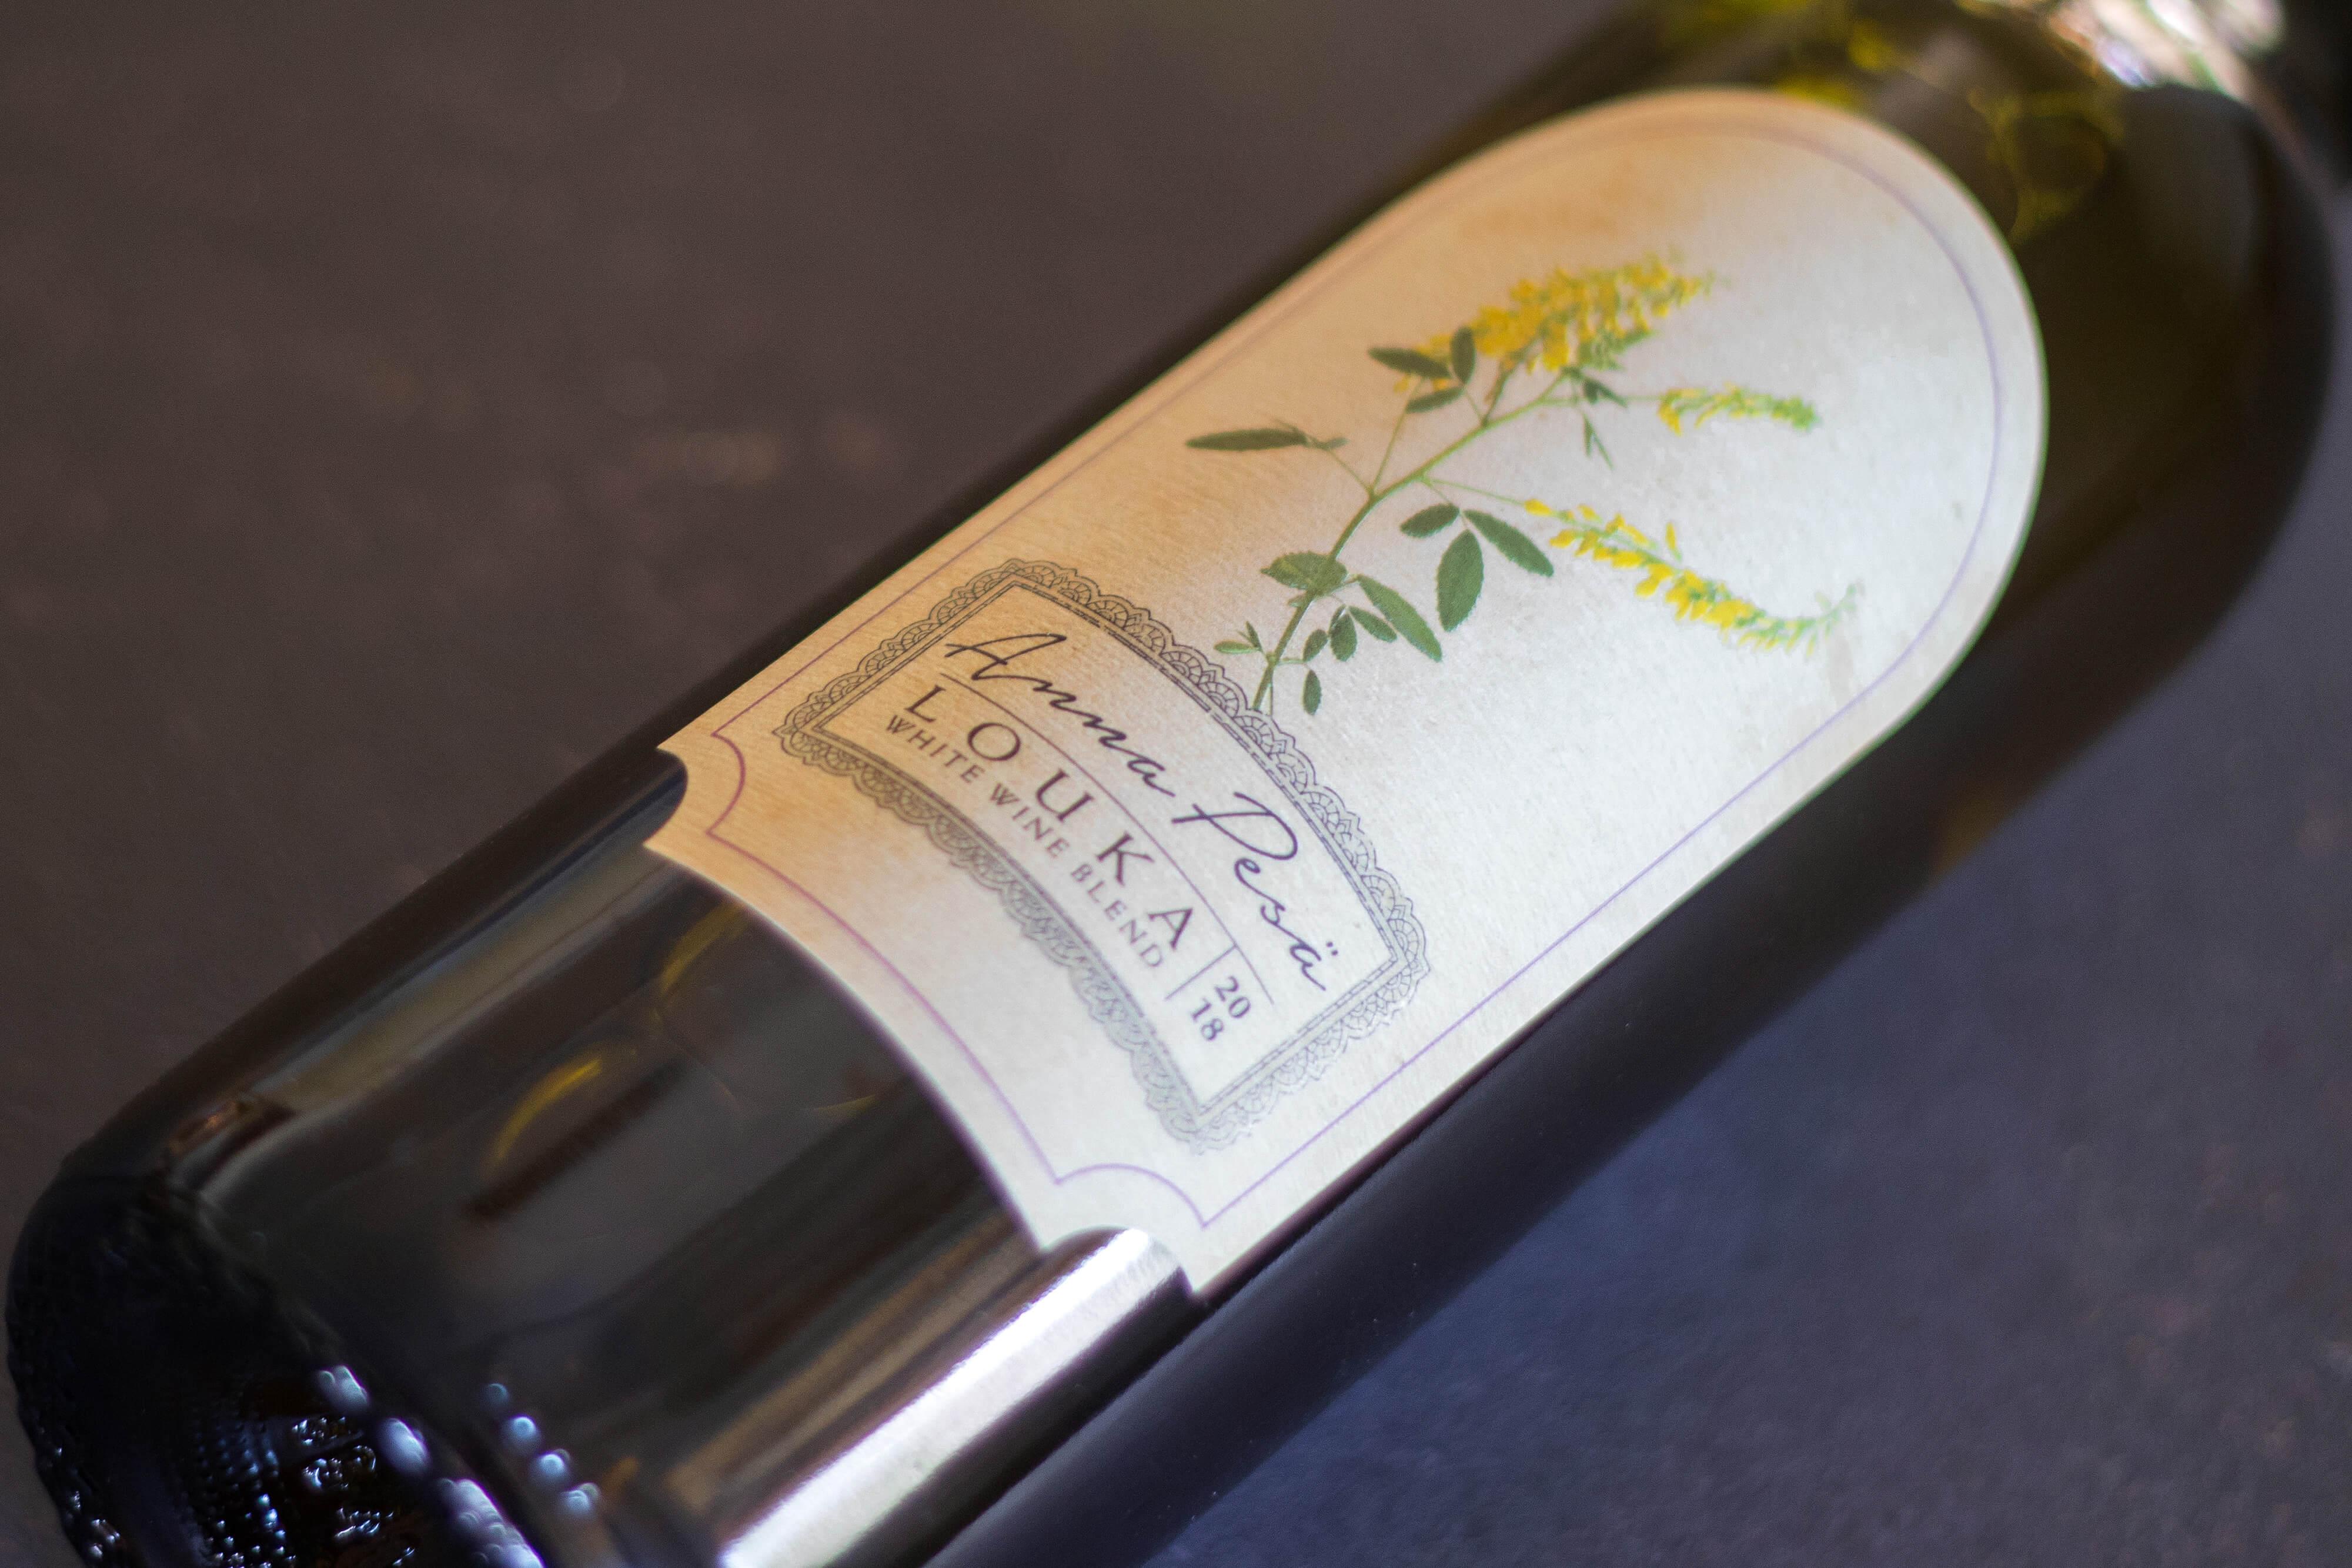 A bottle of Anna Pesä Louka 2018, a blended dry white wine